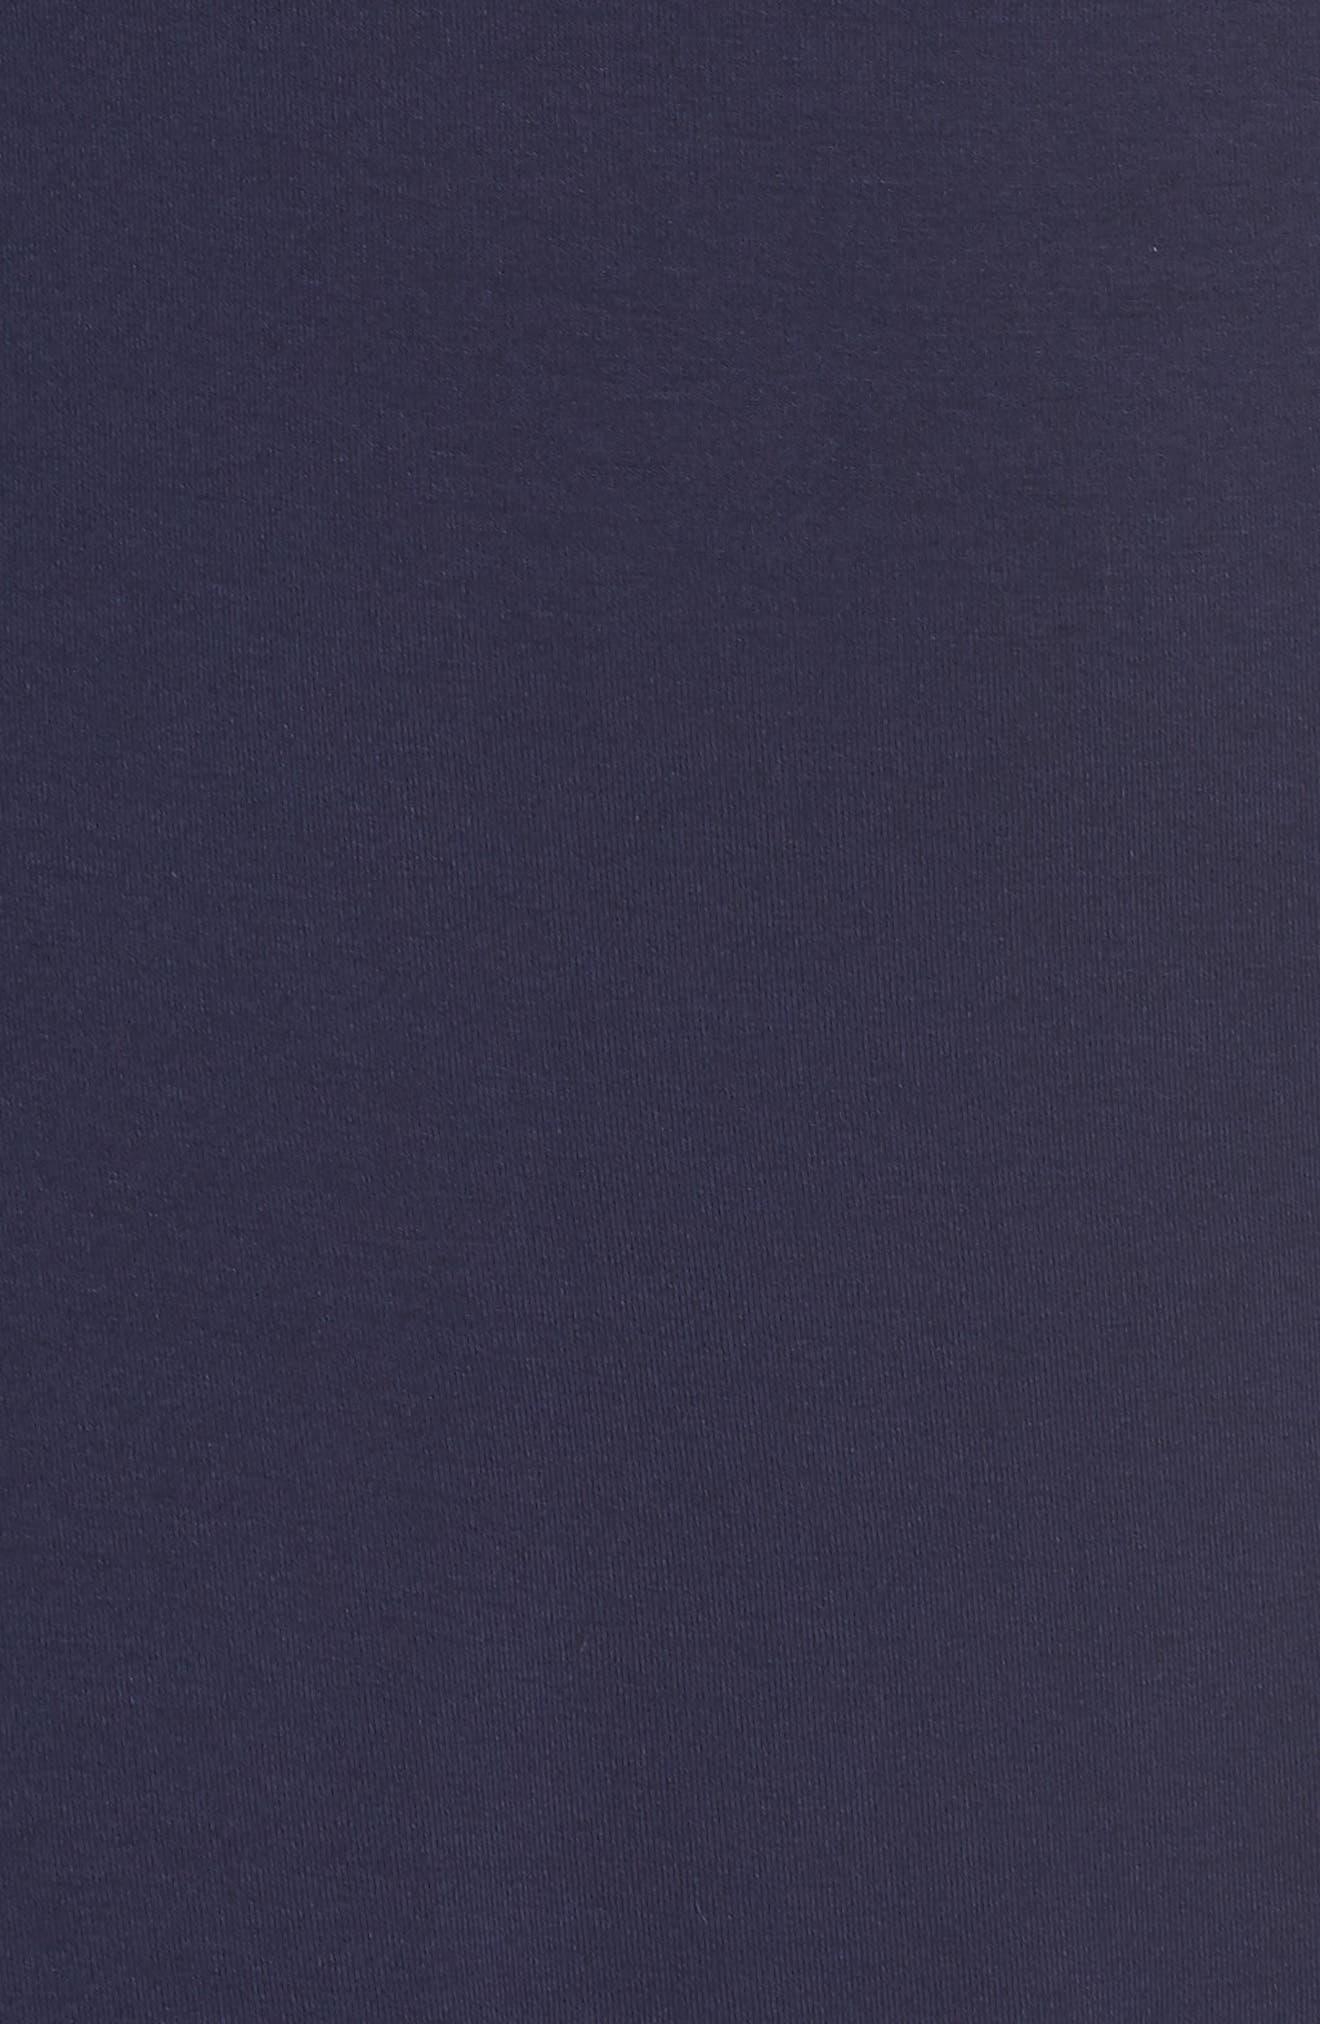 LILLY PULITZER<SUP>®</SUP>, Misha Wrap Dress, Alternate thumbnail 5, color, TRUE NAVY